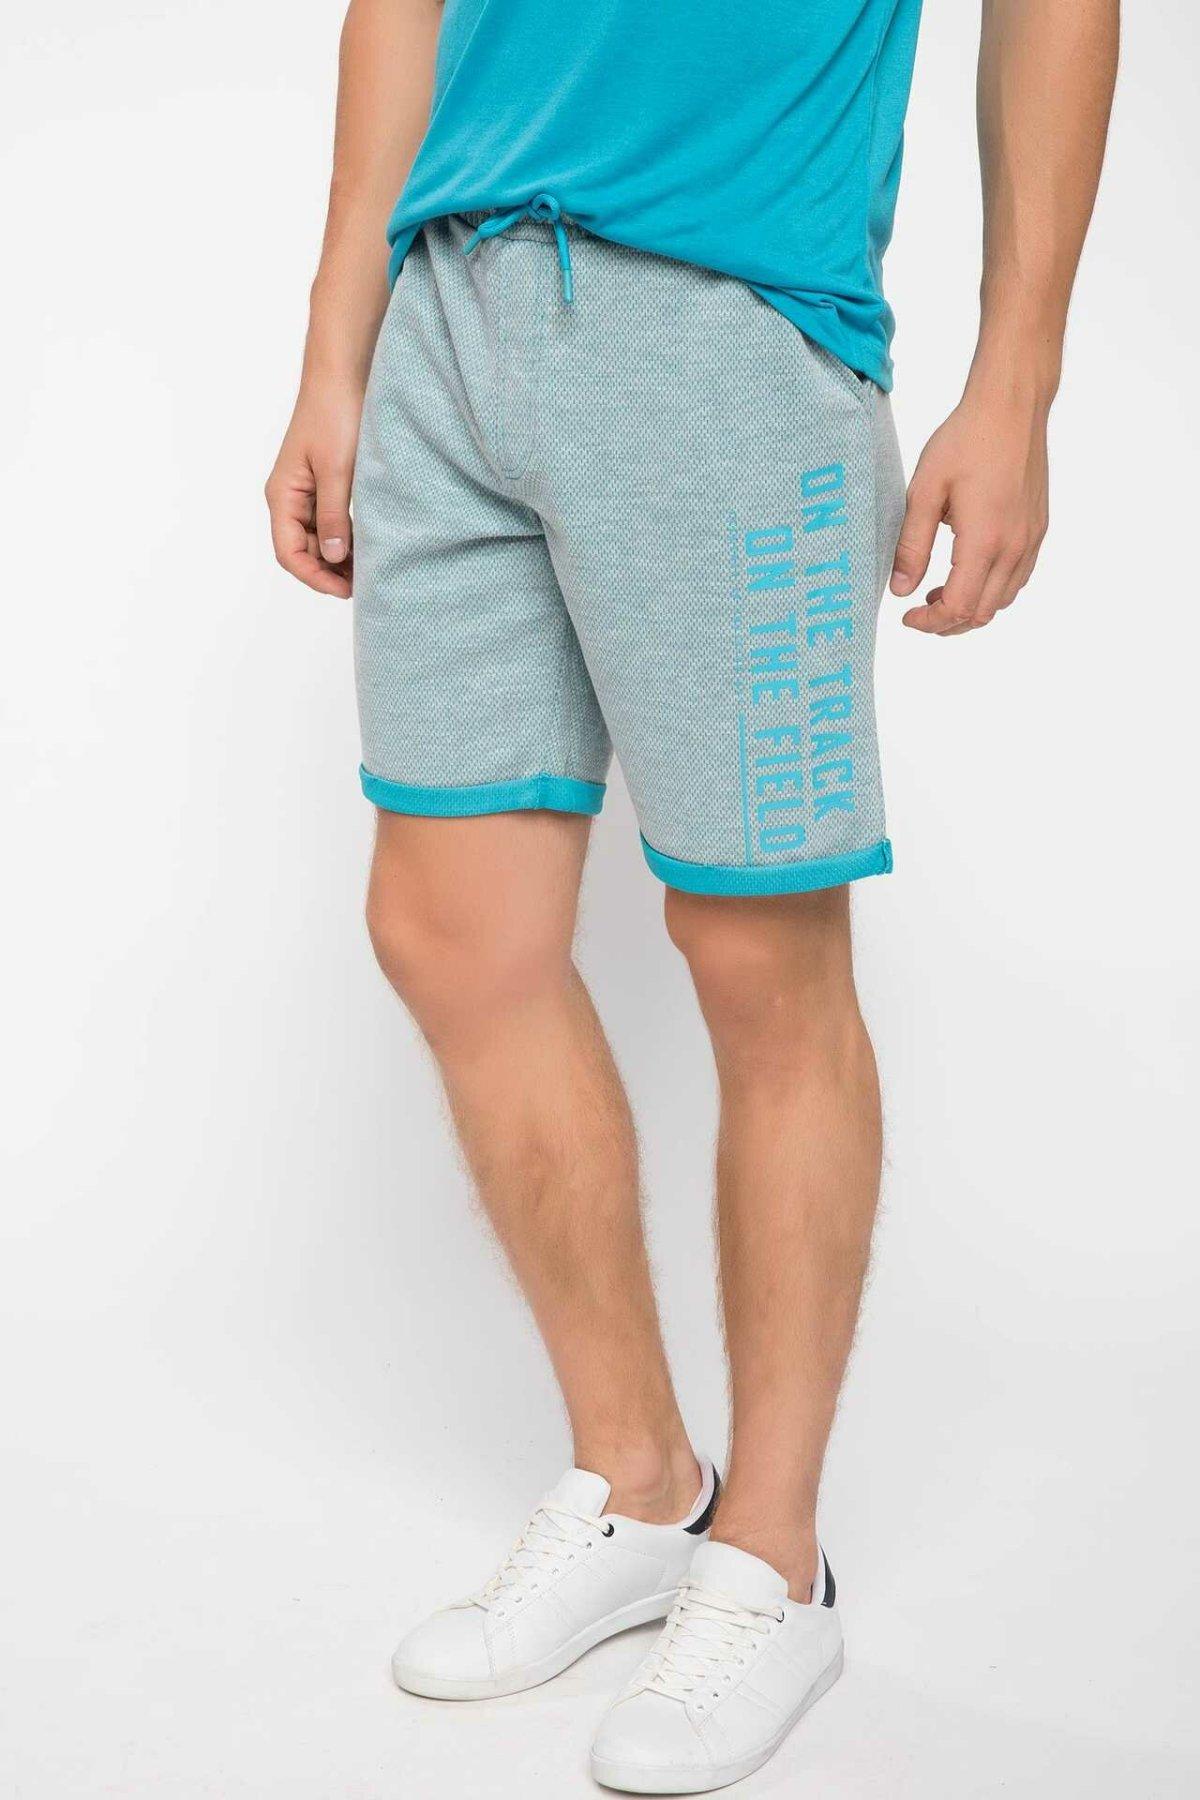 DeFacto Summer Man Cotton Bottoms Fashion Male Letter Pattern Side Shorts Men's Casual Loose Sweatpants New - I8621AZ18HS